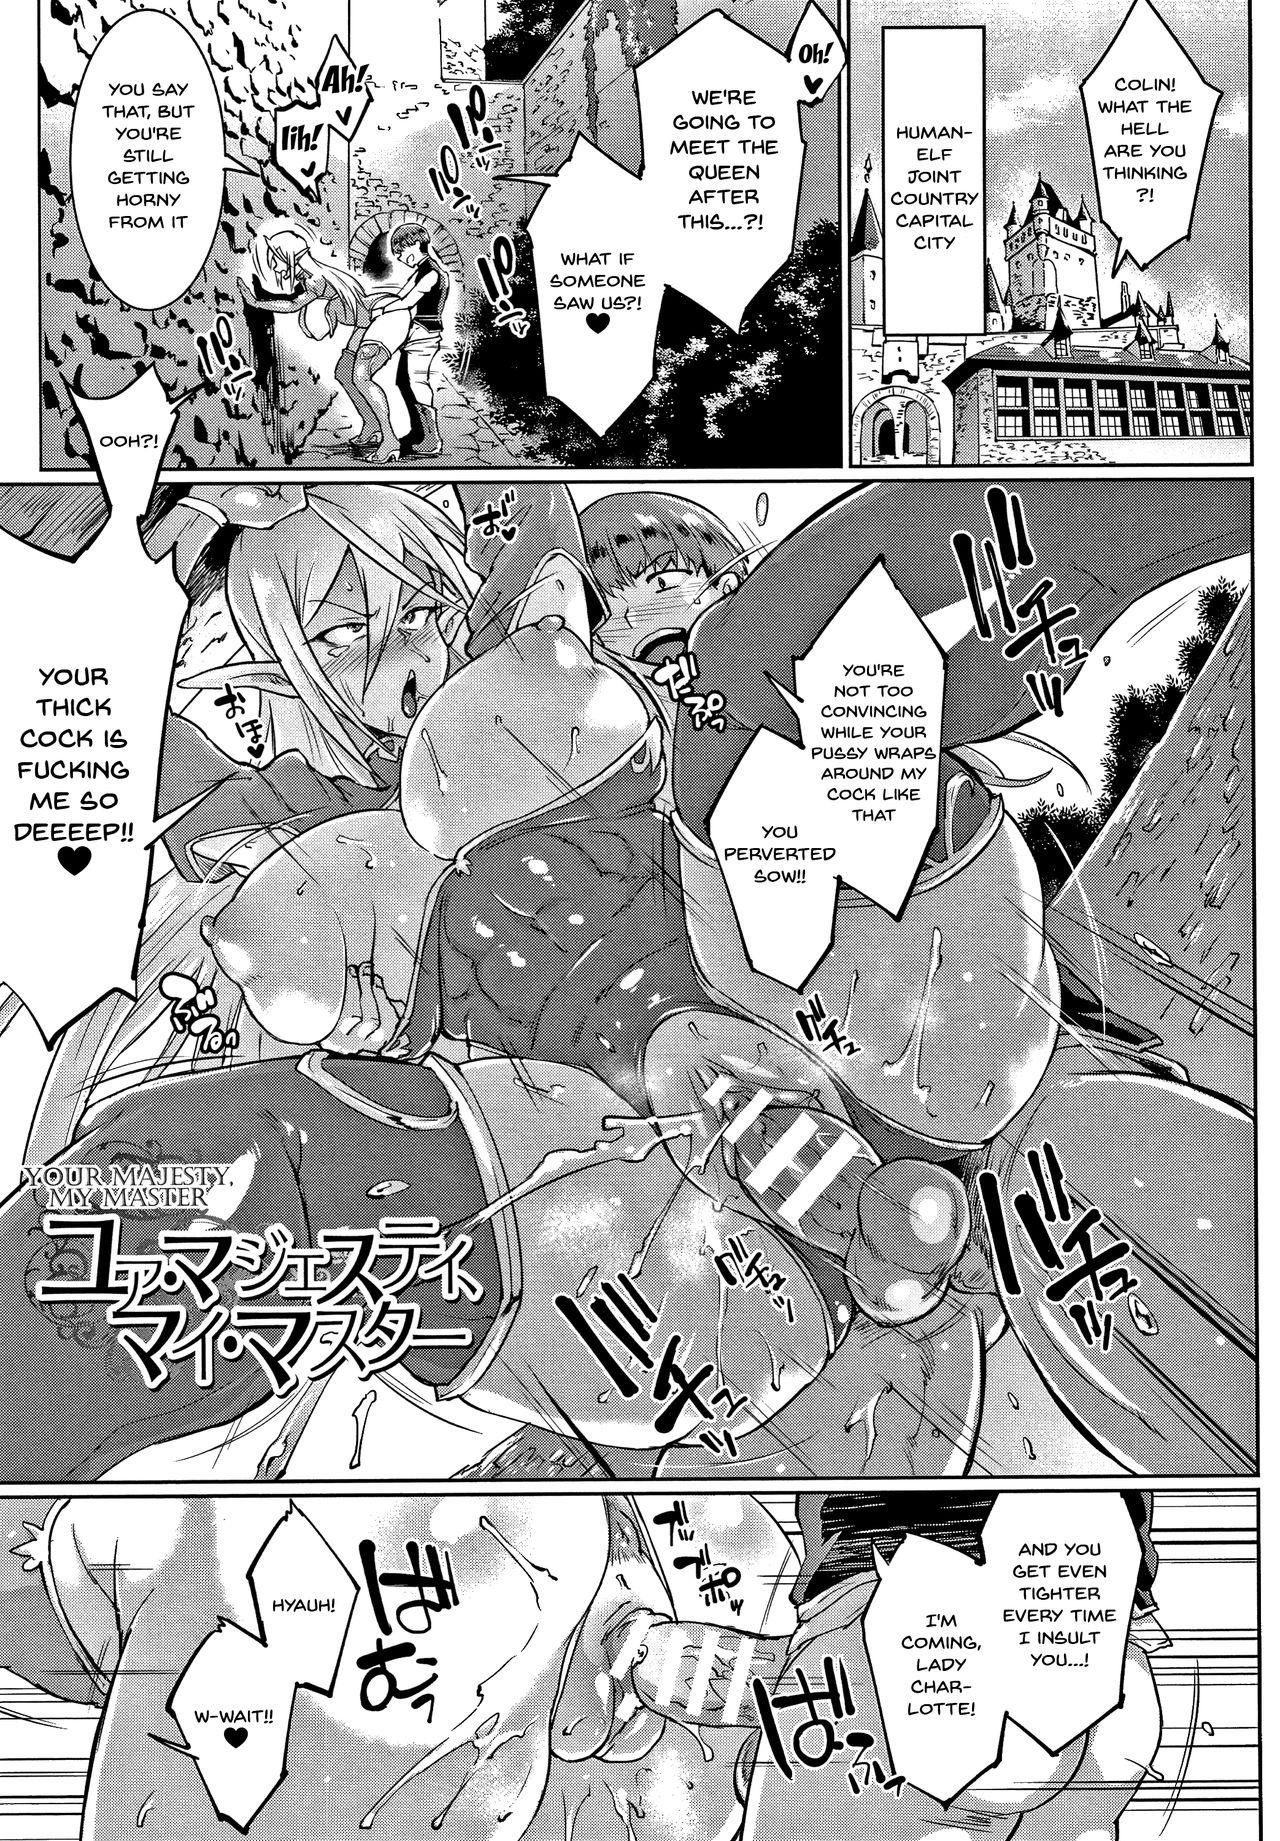 [Fan no Hitori] Sennen Reijou ~My Lady, My Master~  Ch.1-6 [English] {Doujins.com} 31